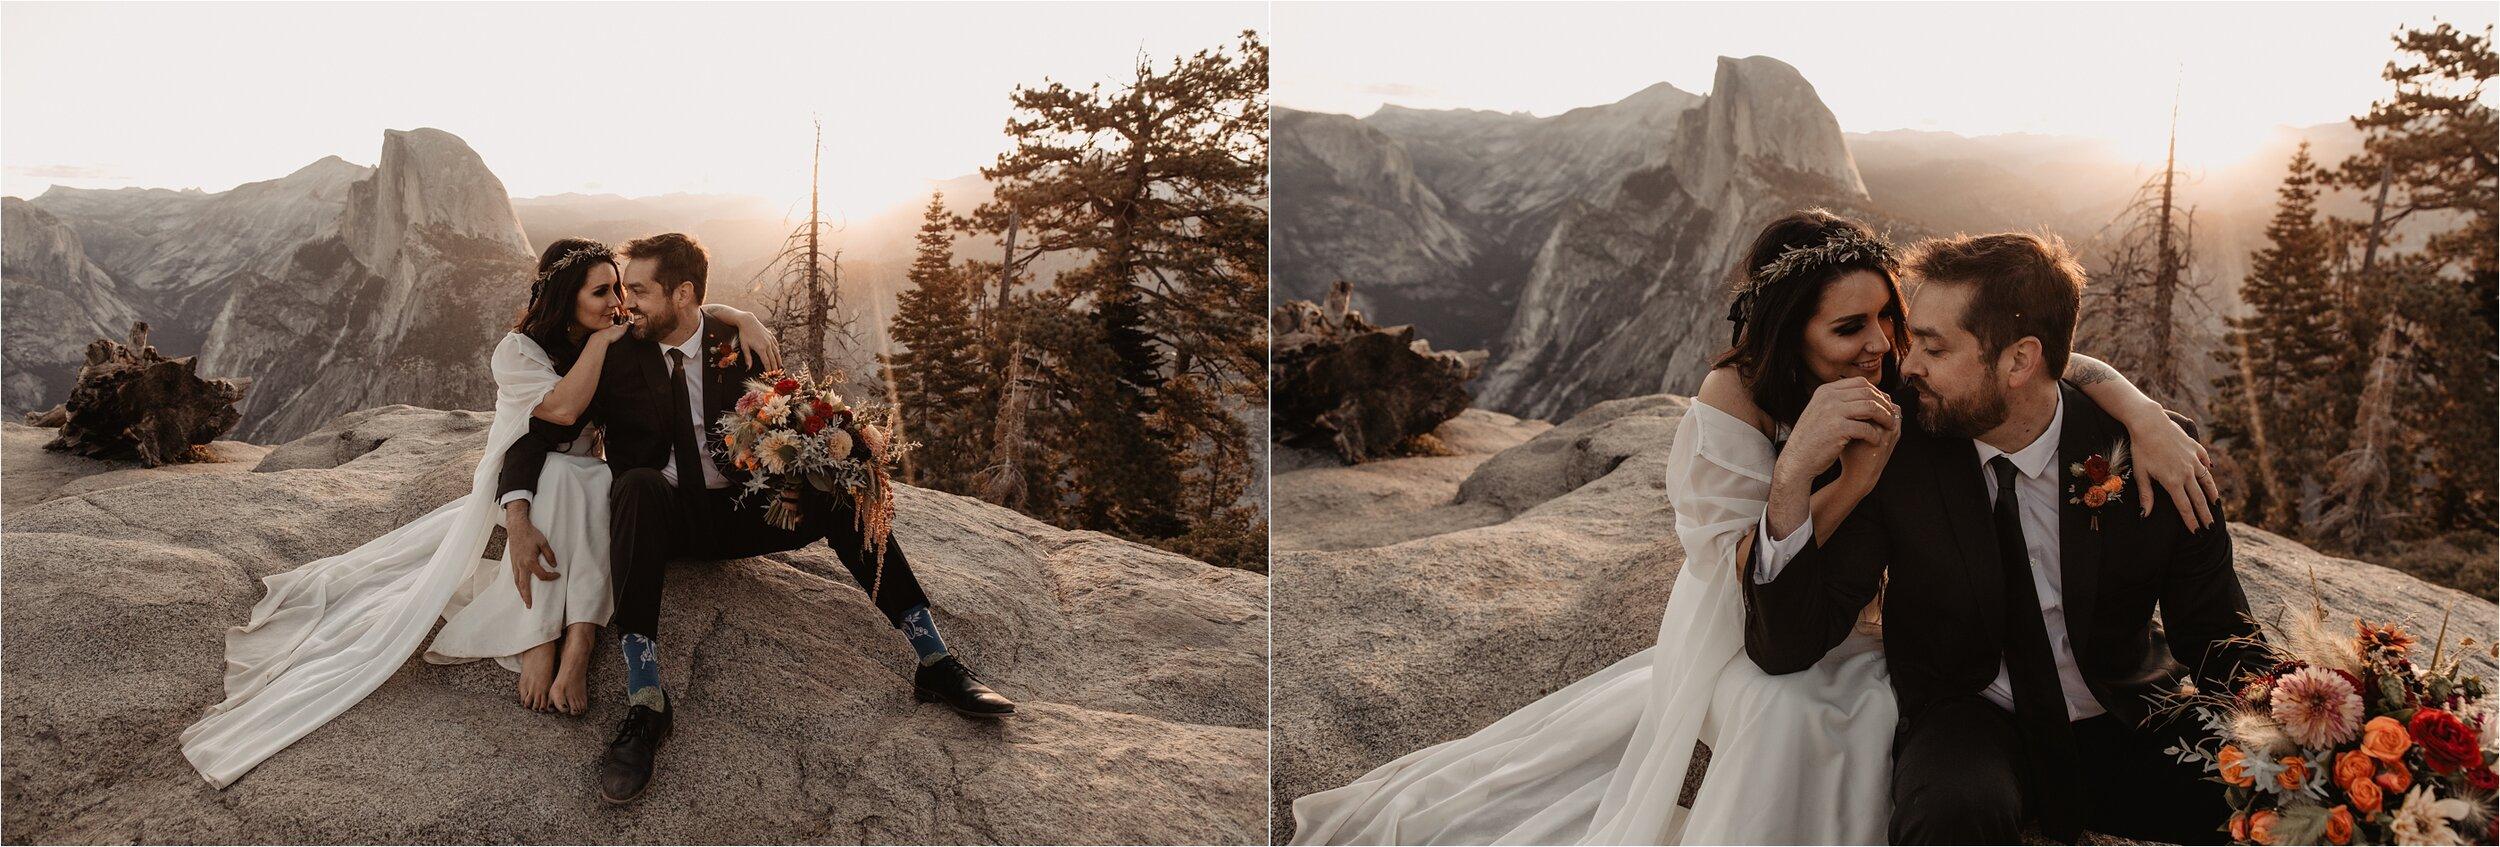 glacier-point-yosemite-elopement-ceremony_0029.jpg